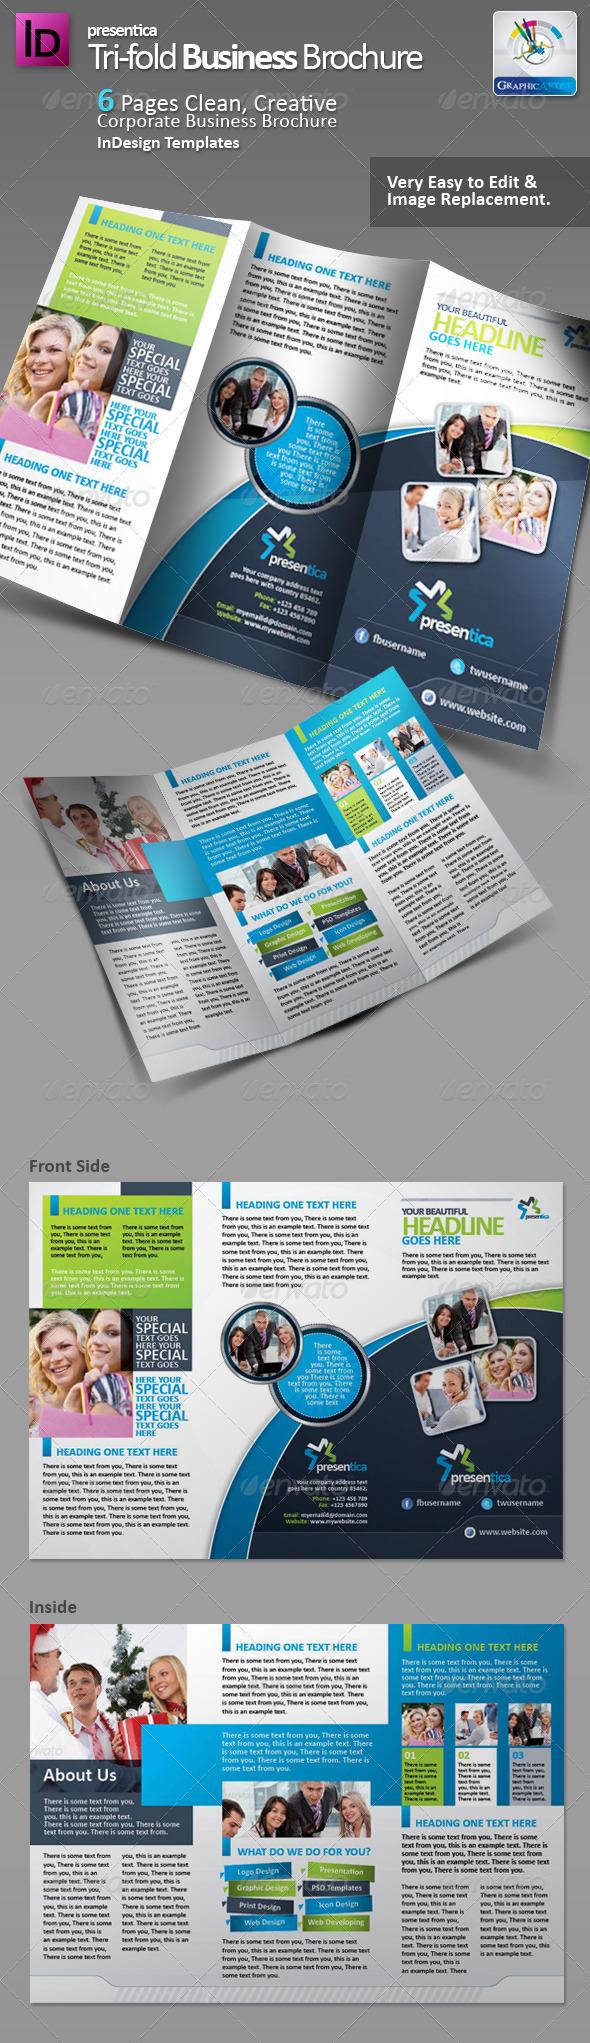 Presentica Tri-fold Corporate Brochure - Corporate Brochures